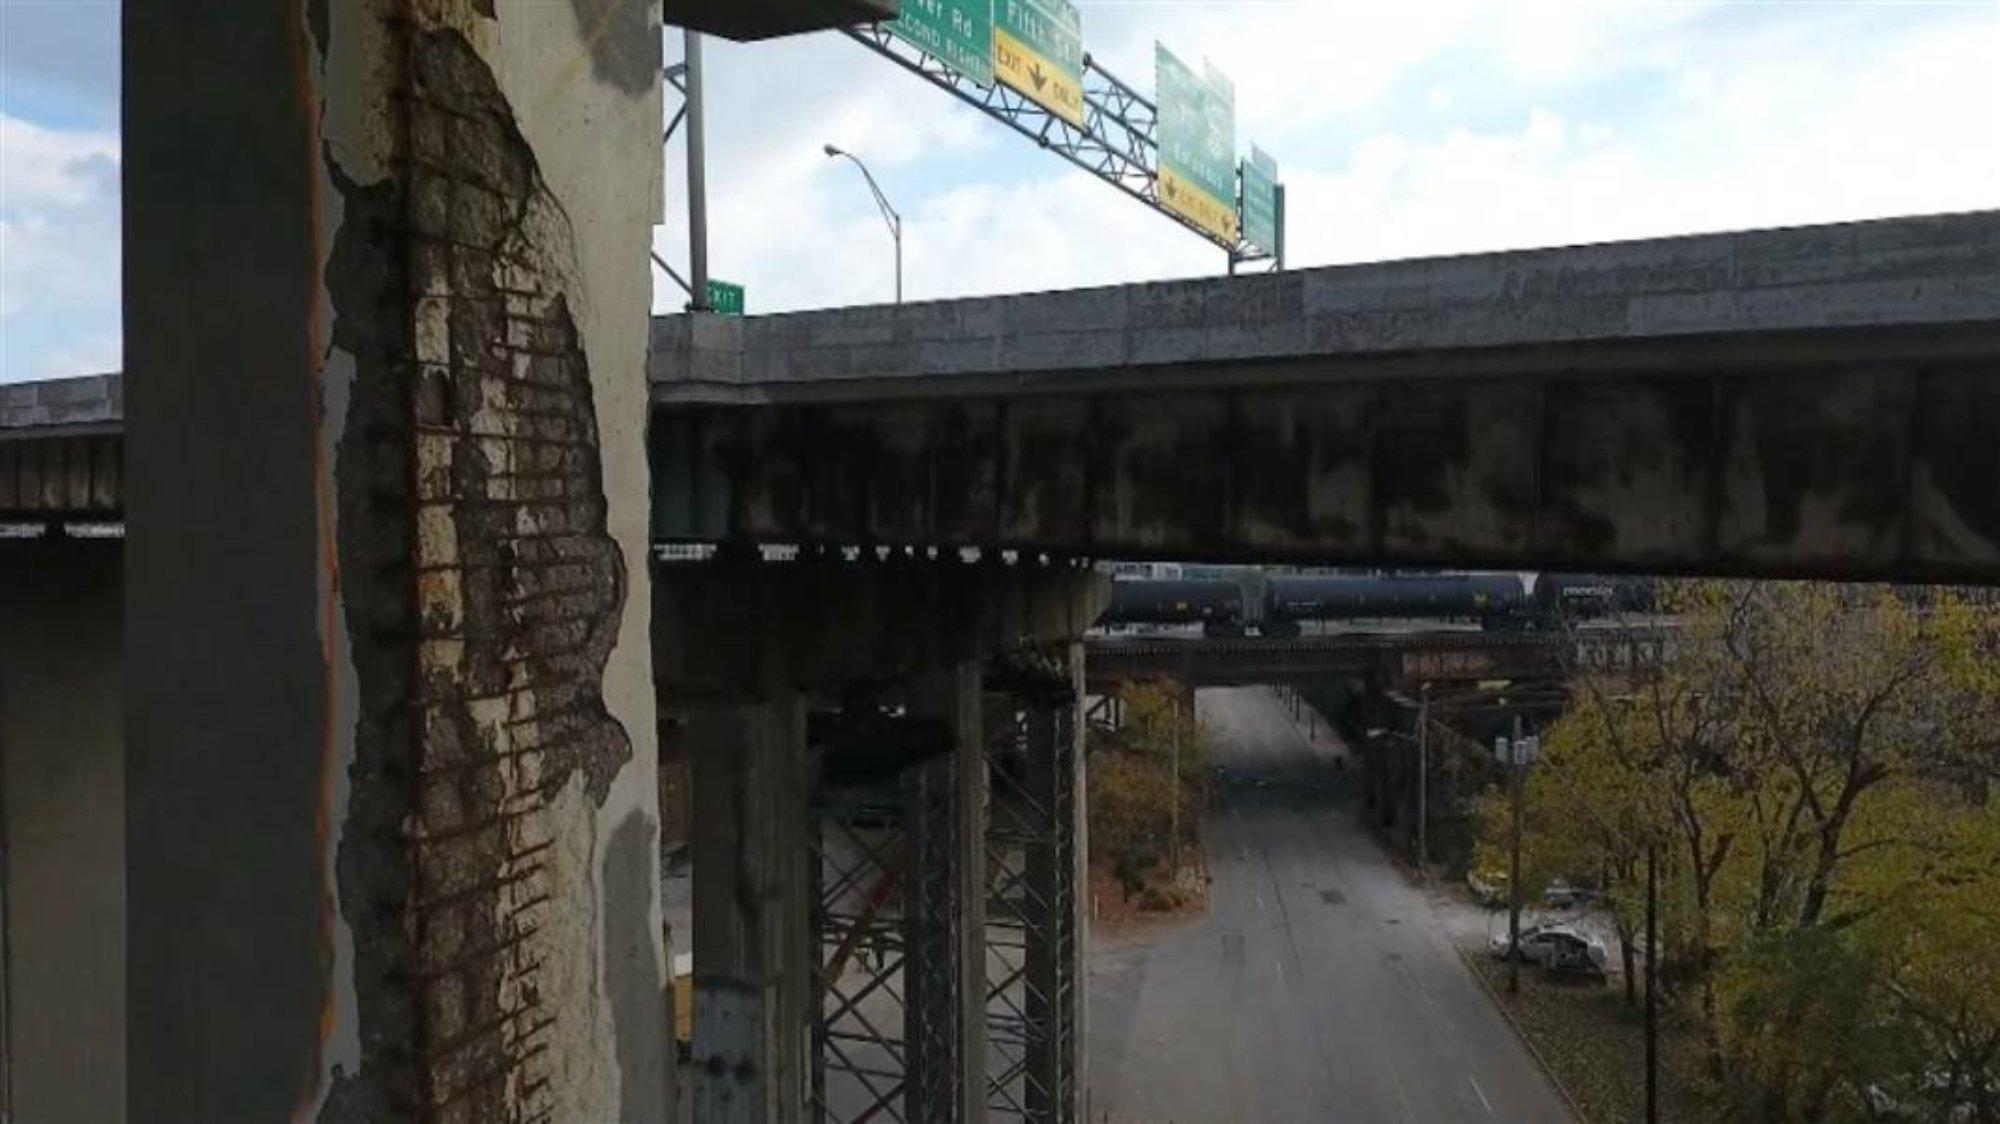 US Infrastructure in Disrepair